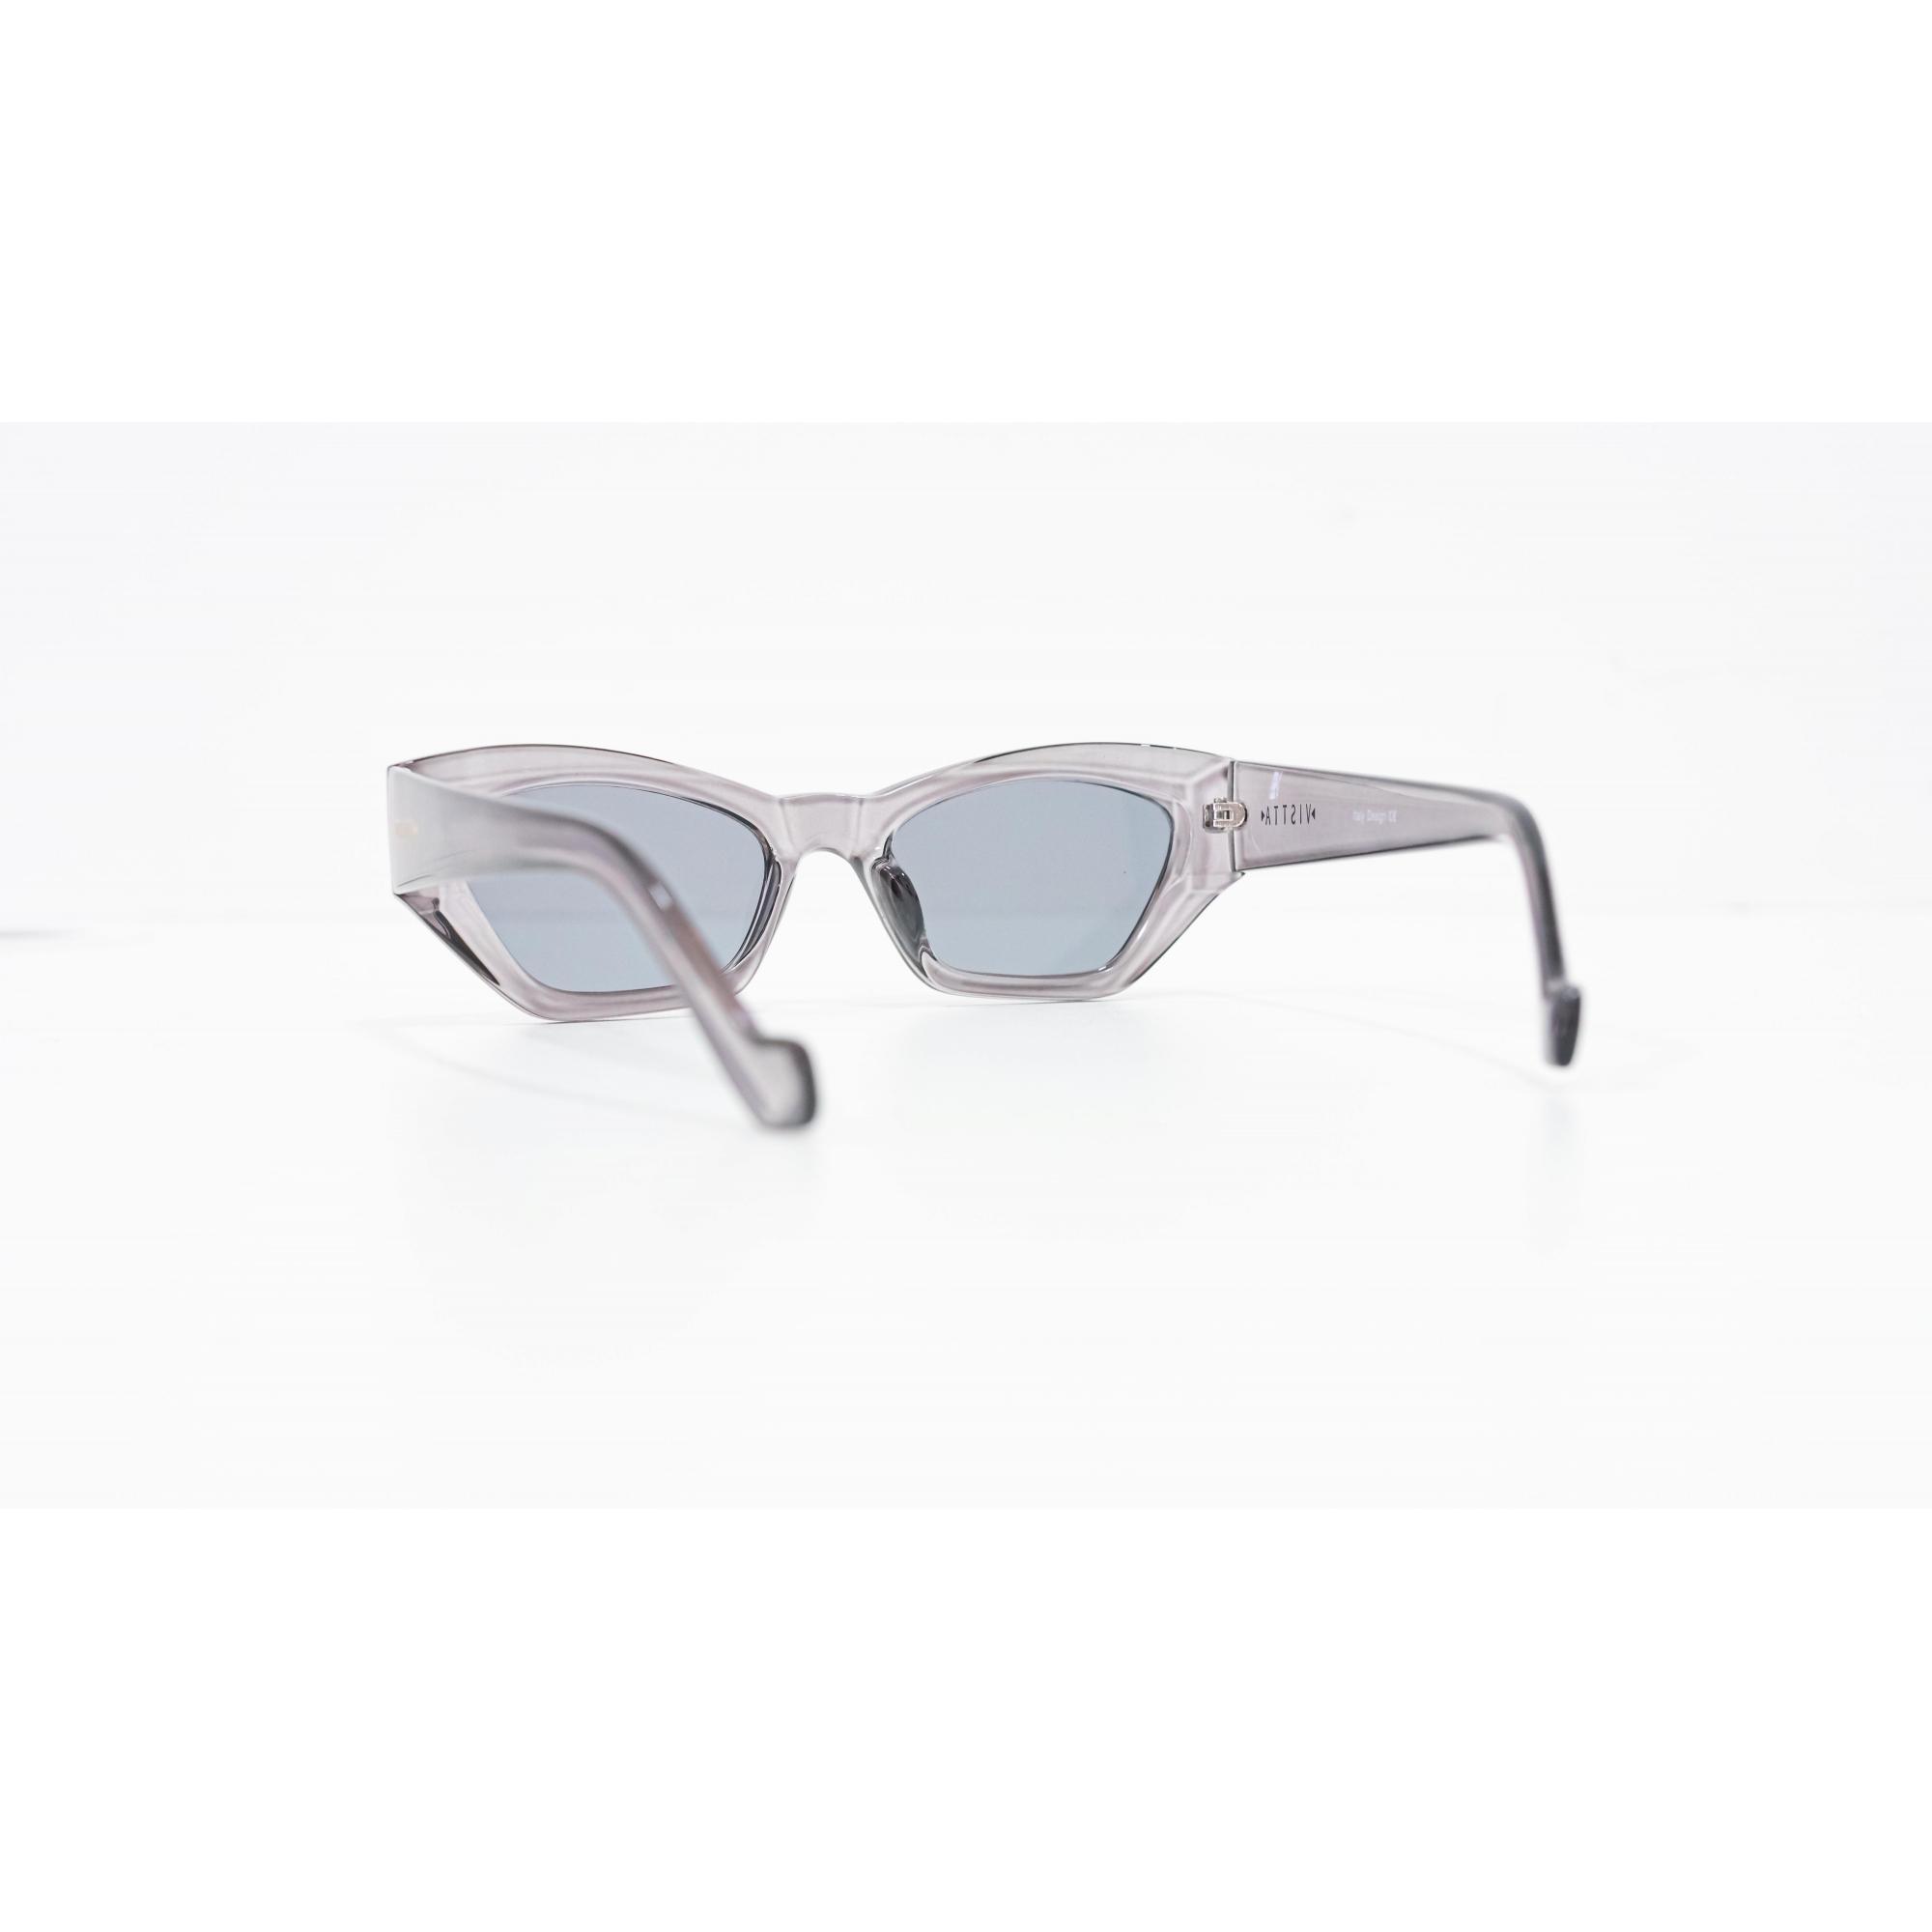 Óculos Vistta Aping Irregular LQ9006 C5 45 Cinza